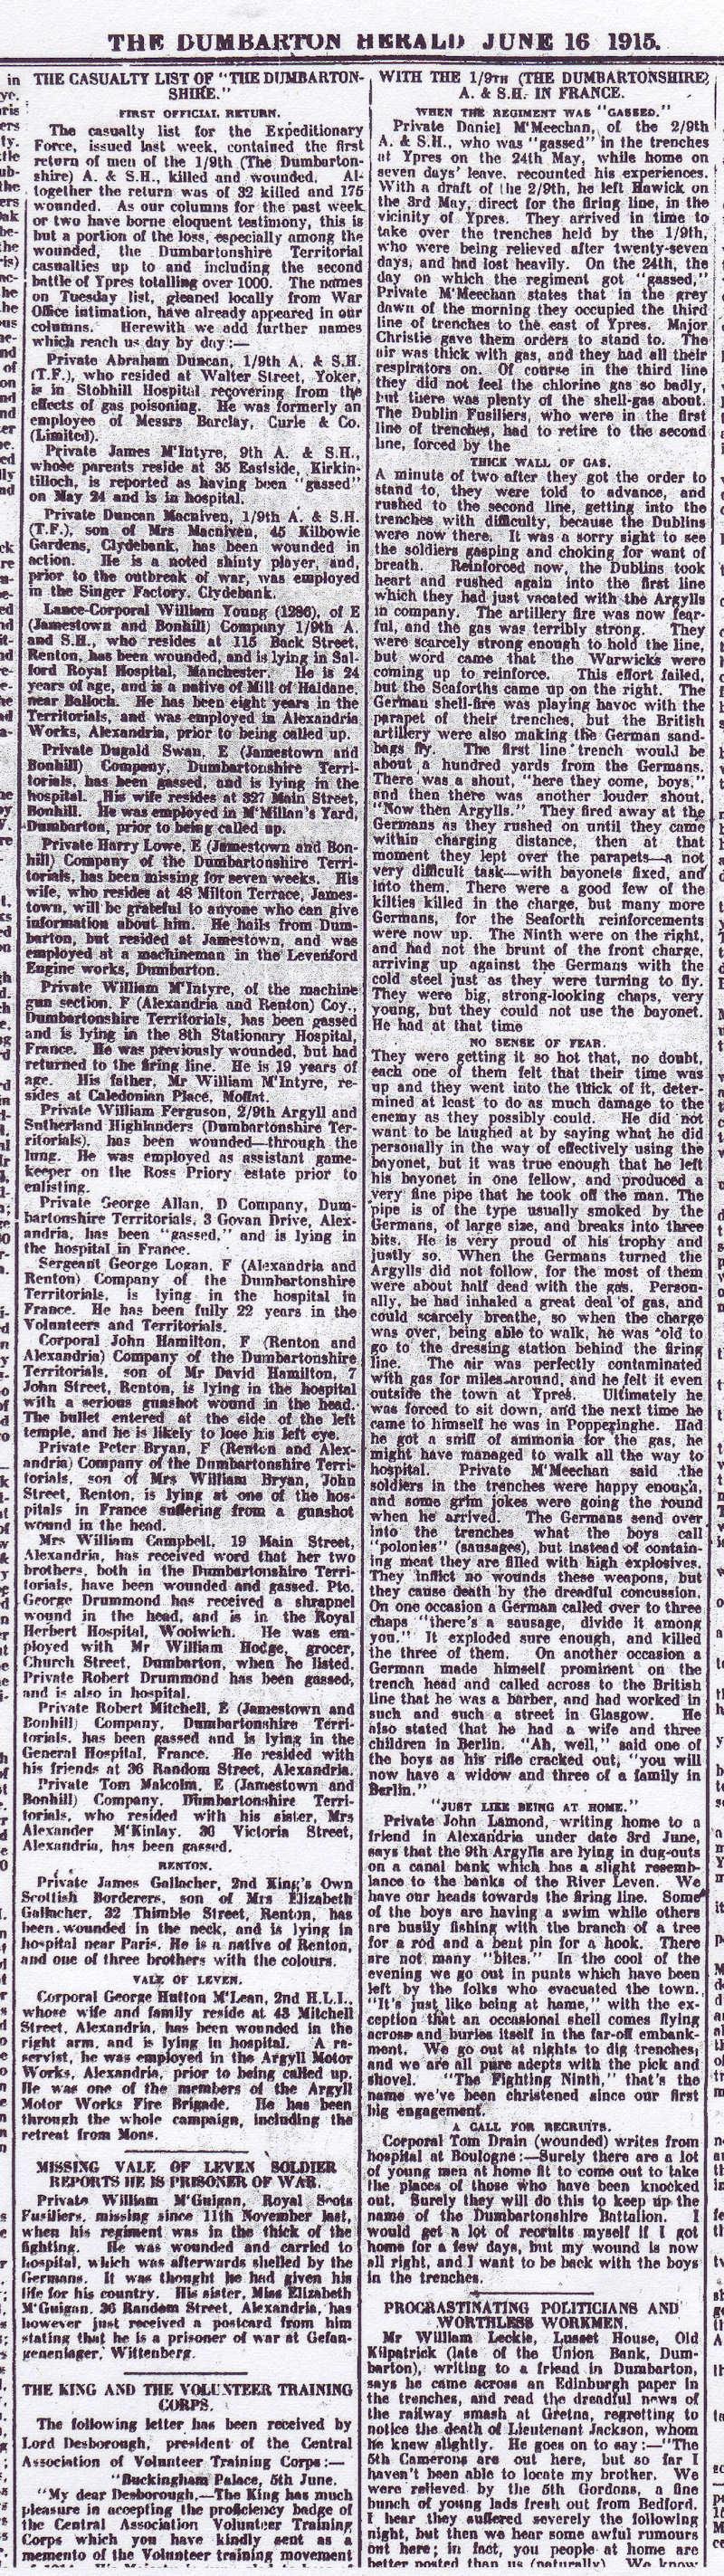 Casualties of world war i essay